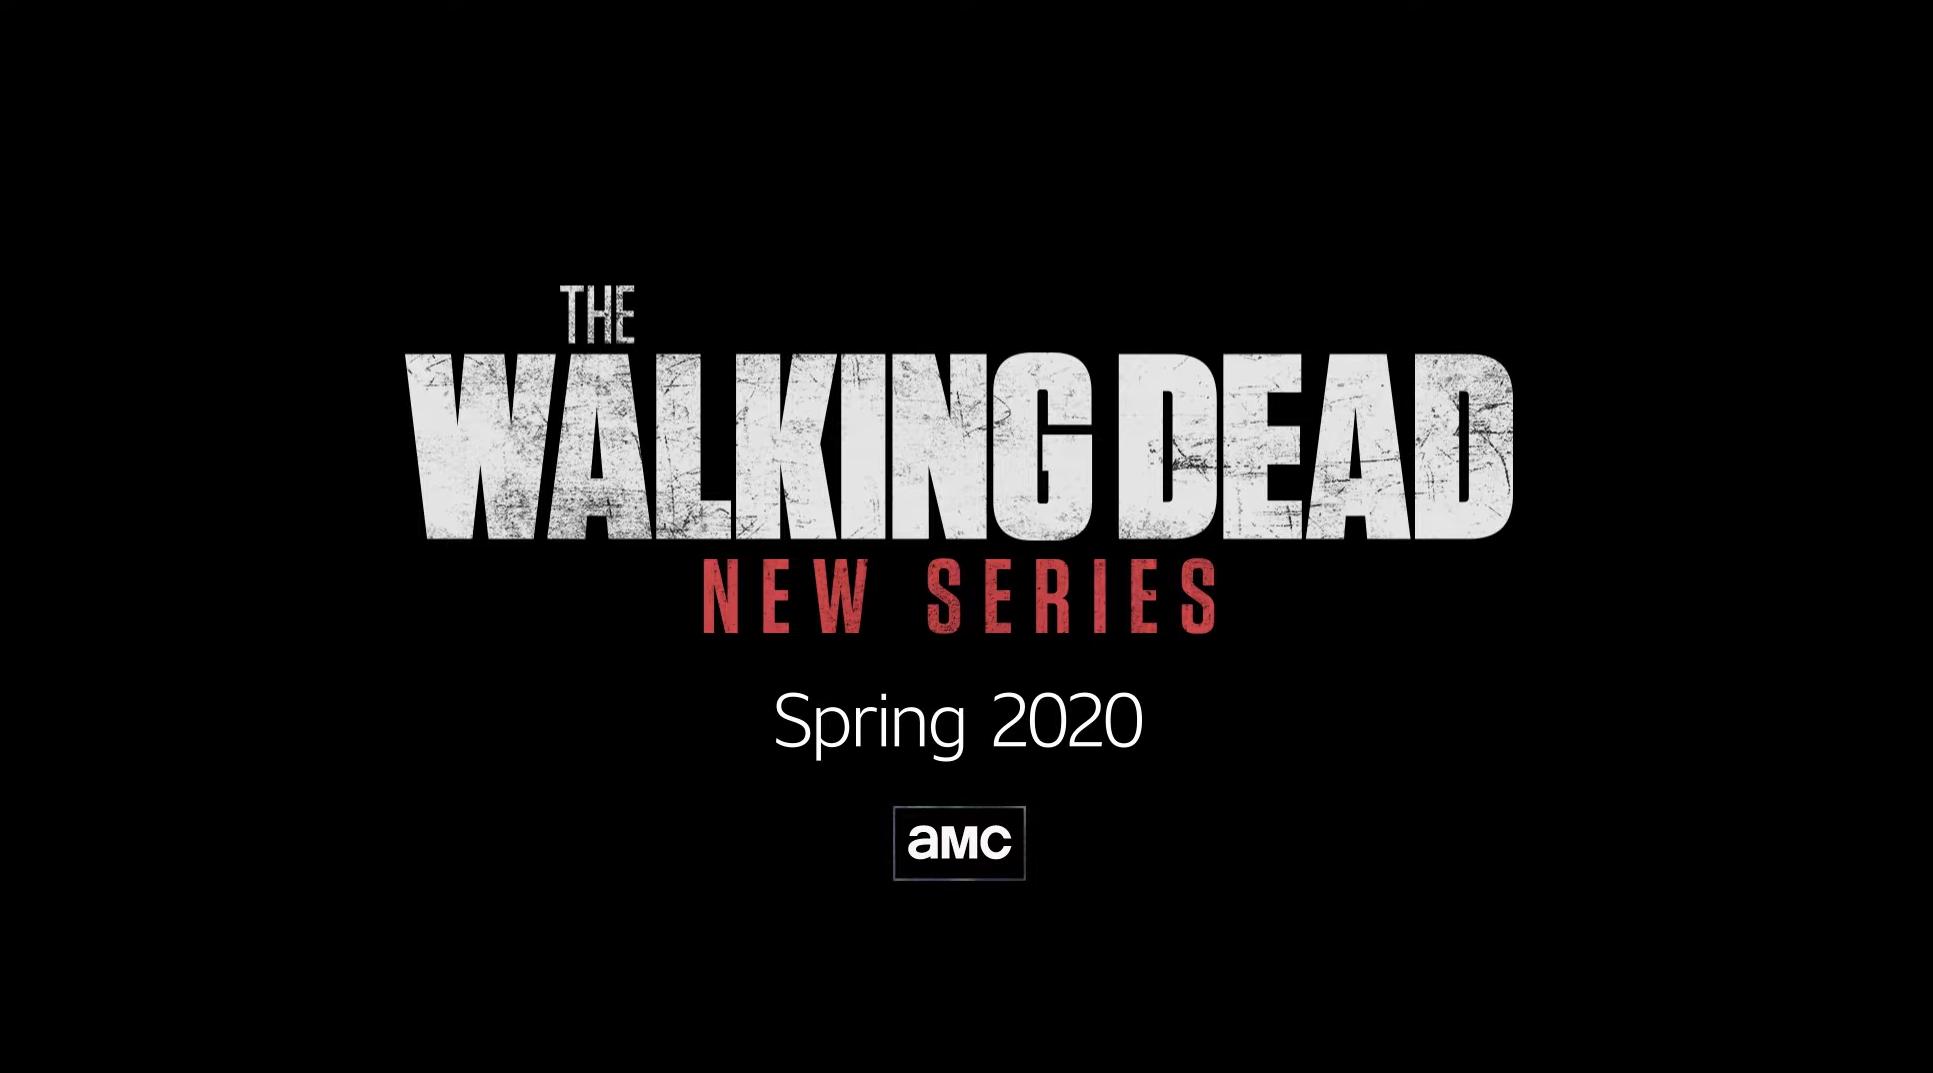 Westlake Legal Group the-walking-dead-new-series 'The Walking Dead' teases spinoff series in new trailer Jeremy Nifras fox-news/entertainment/the-walking-dead fox news fnc/entertainment fnc b0d8803c-4e25-5a8c-b53b-fc4e311973ec article